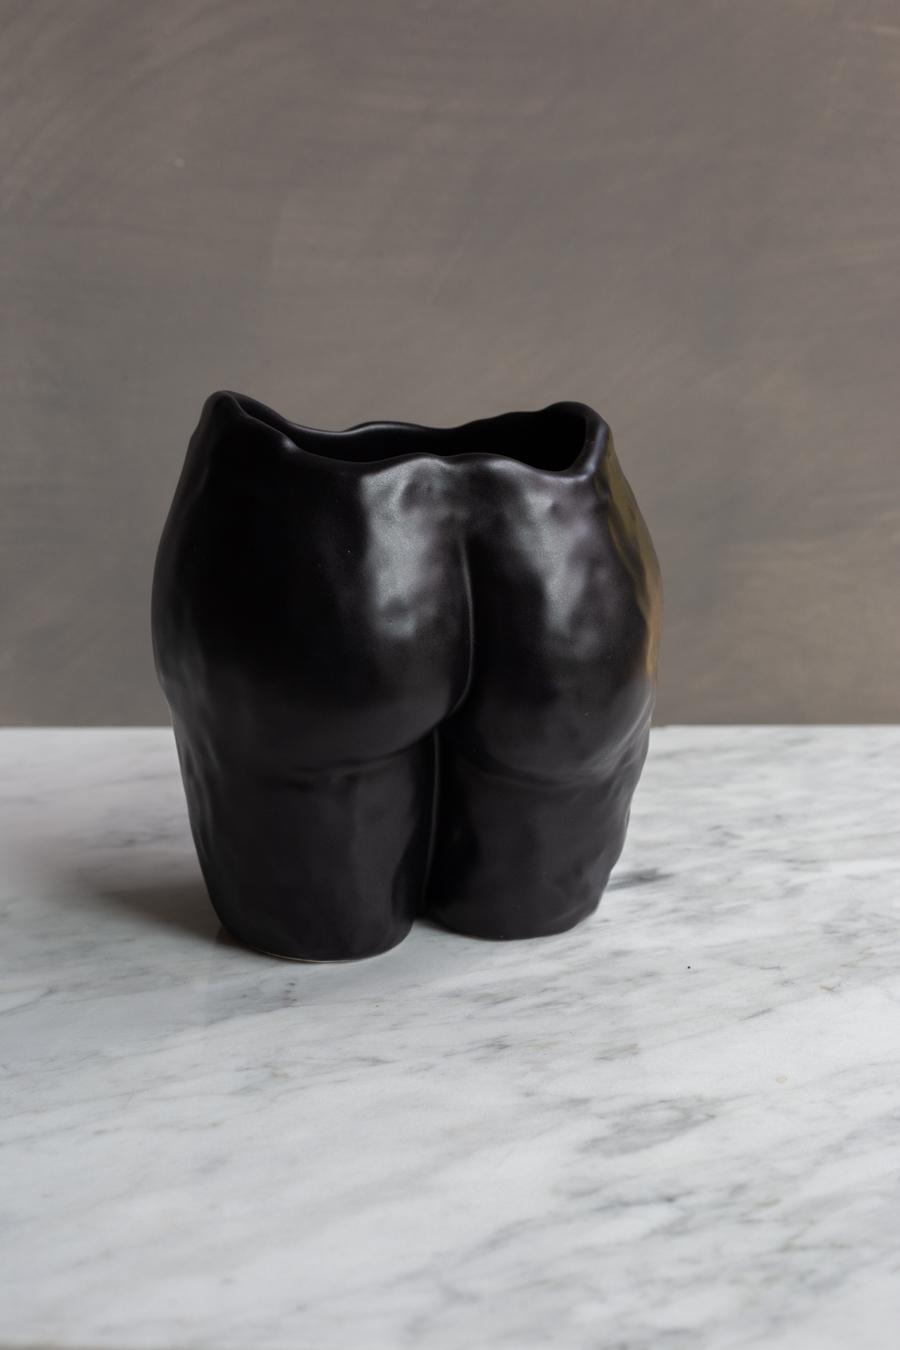 Kermiche Popotlin Pot Black